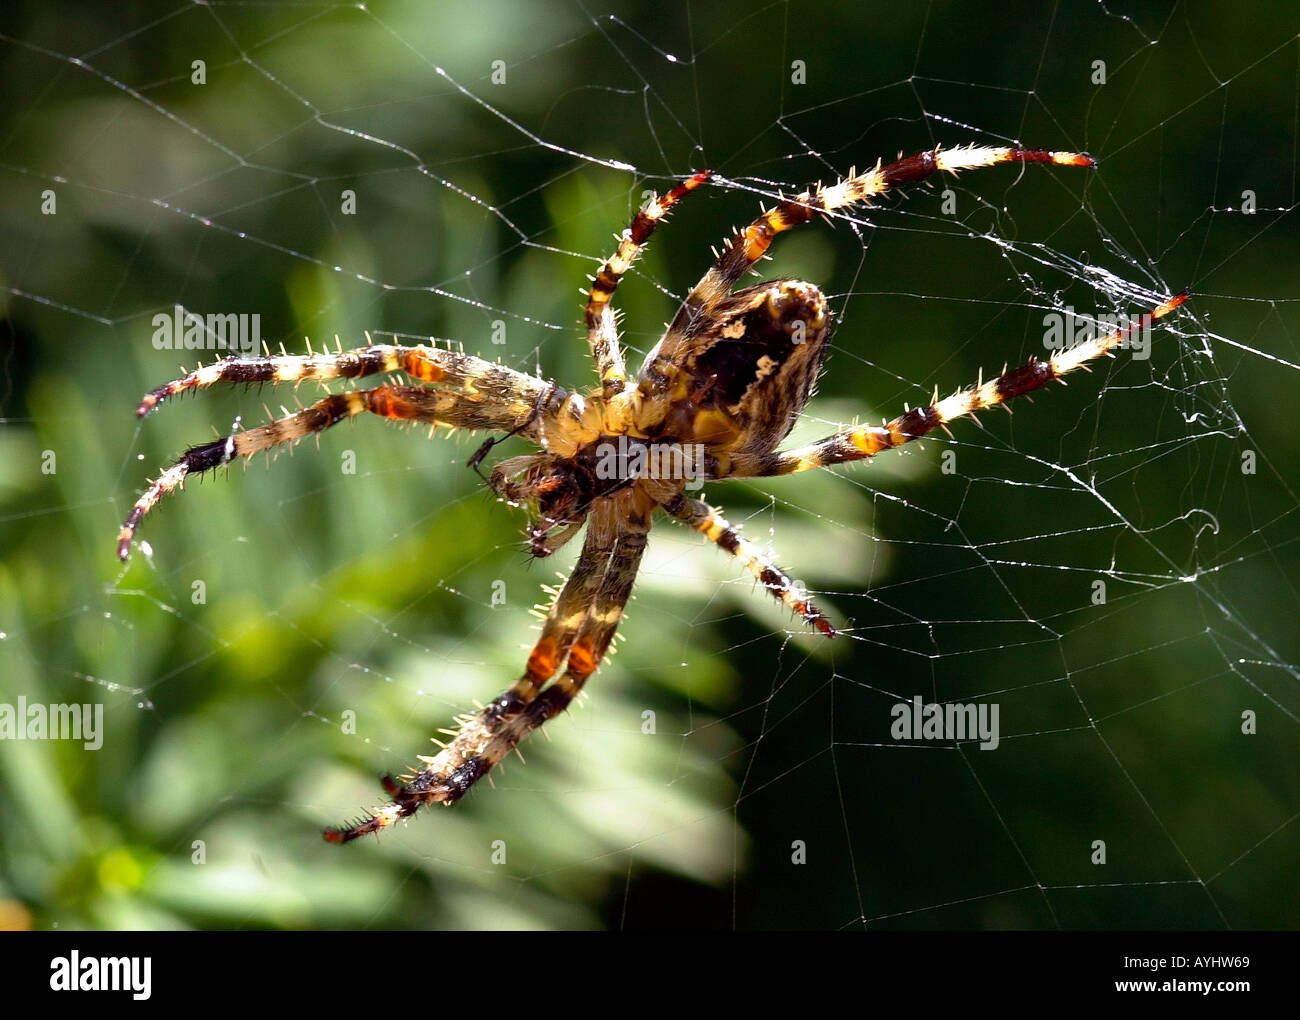 Spinne im Spinnennetz - Stock Image